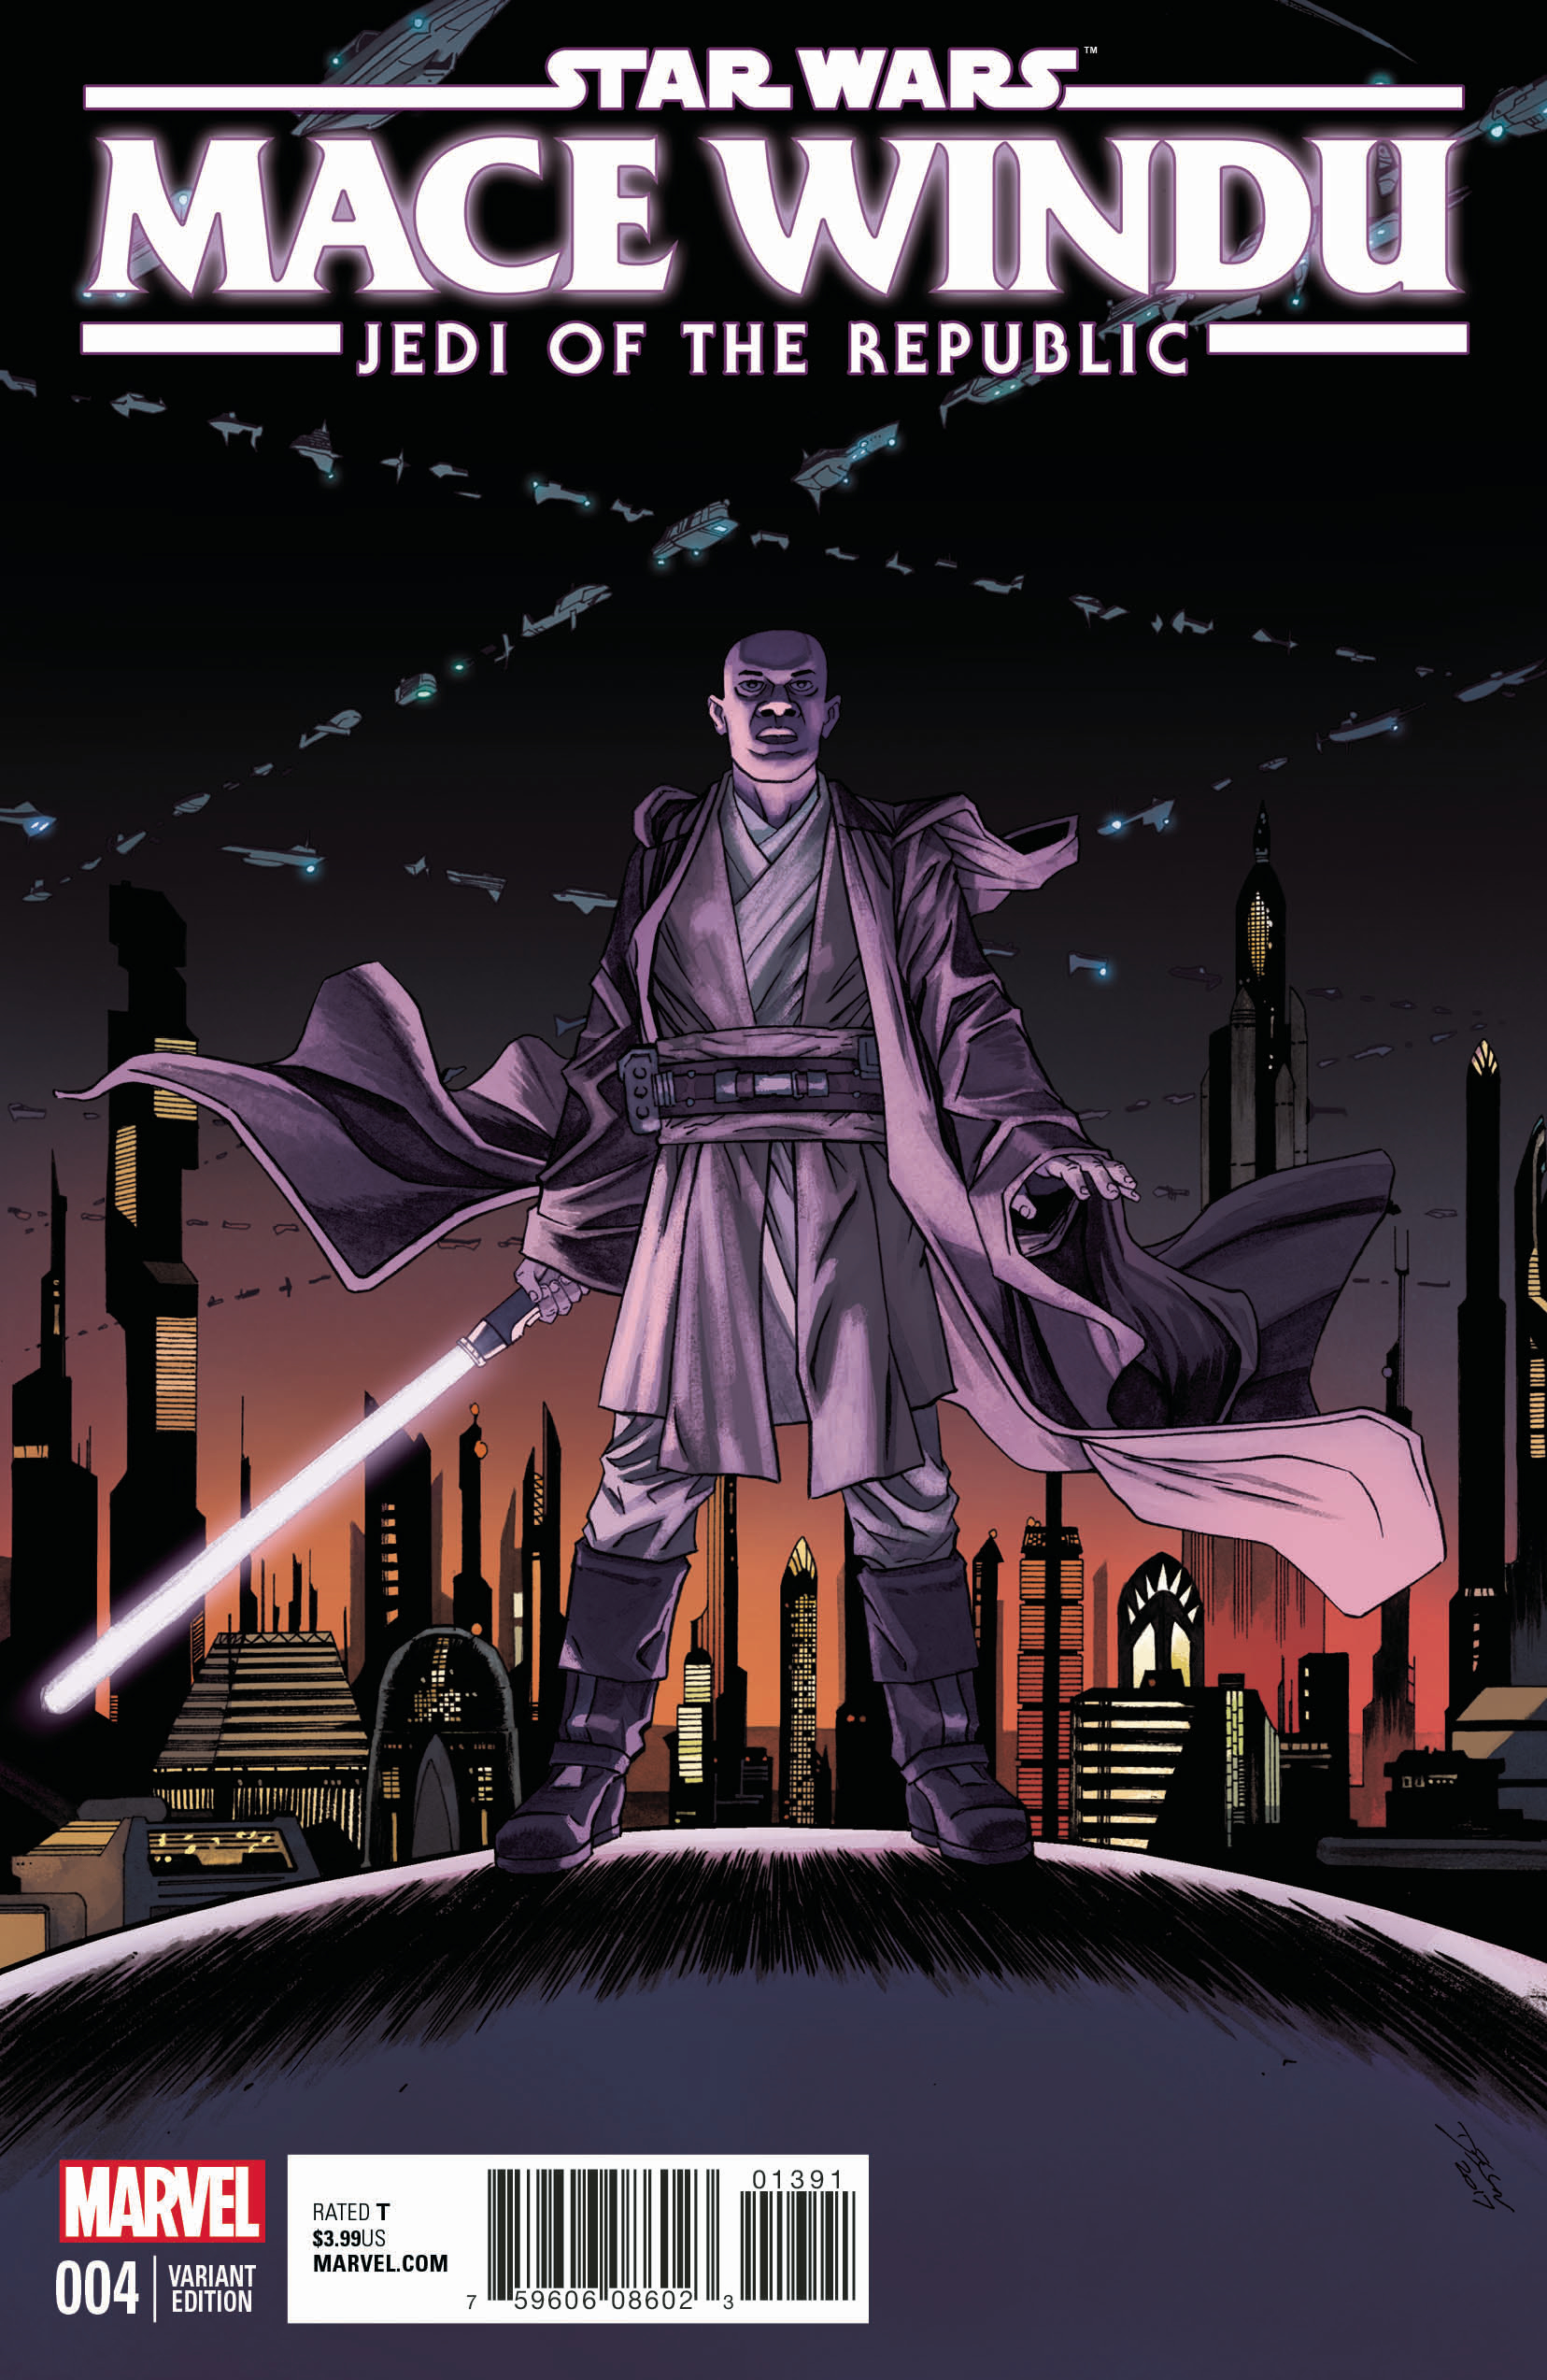 Jedi of the Republic Star Wars Mace Windu